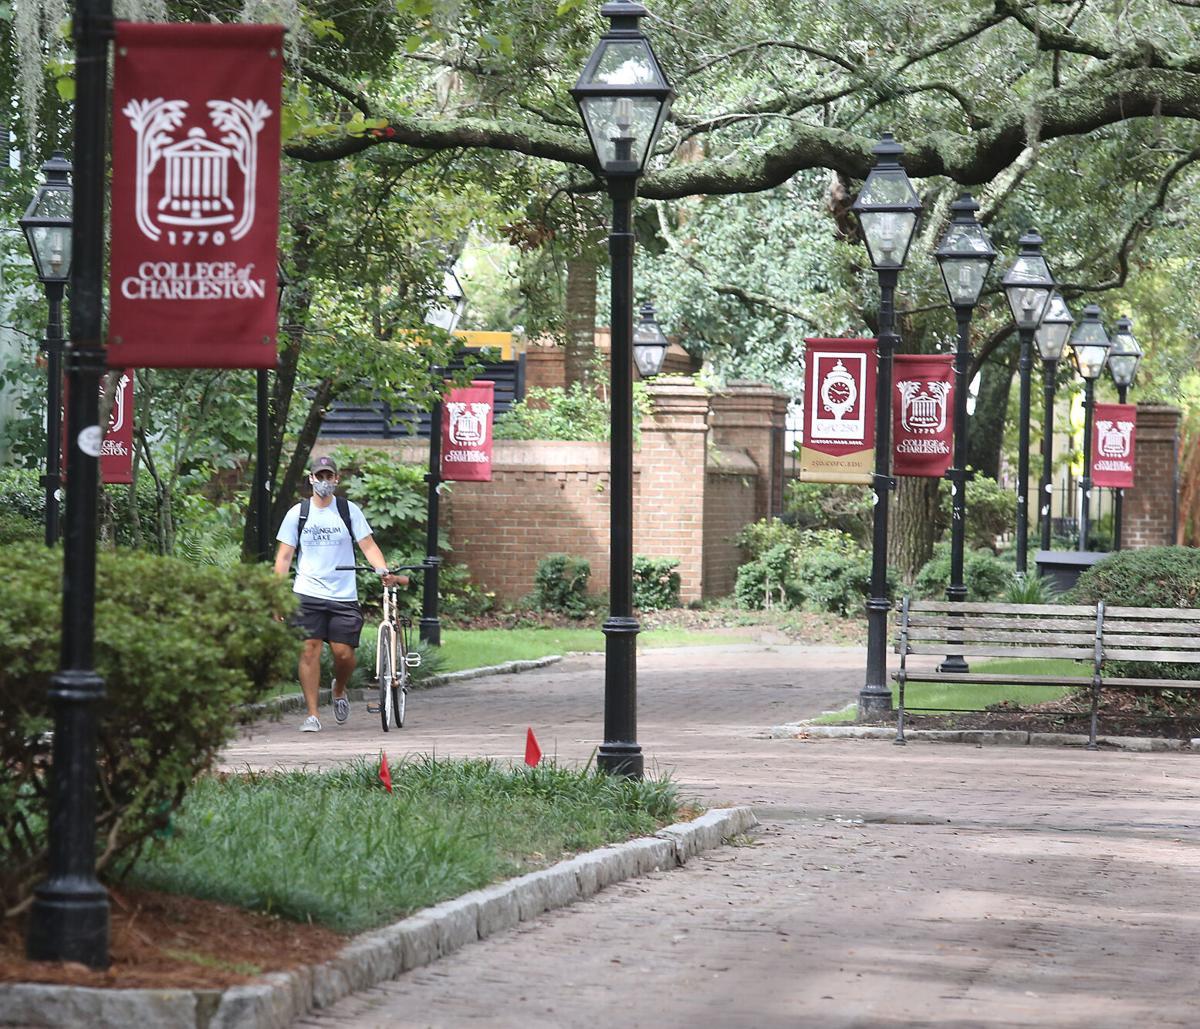 College of Charleston (copy) (copy)